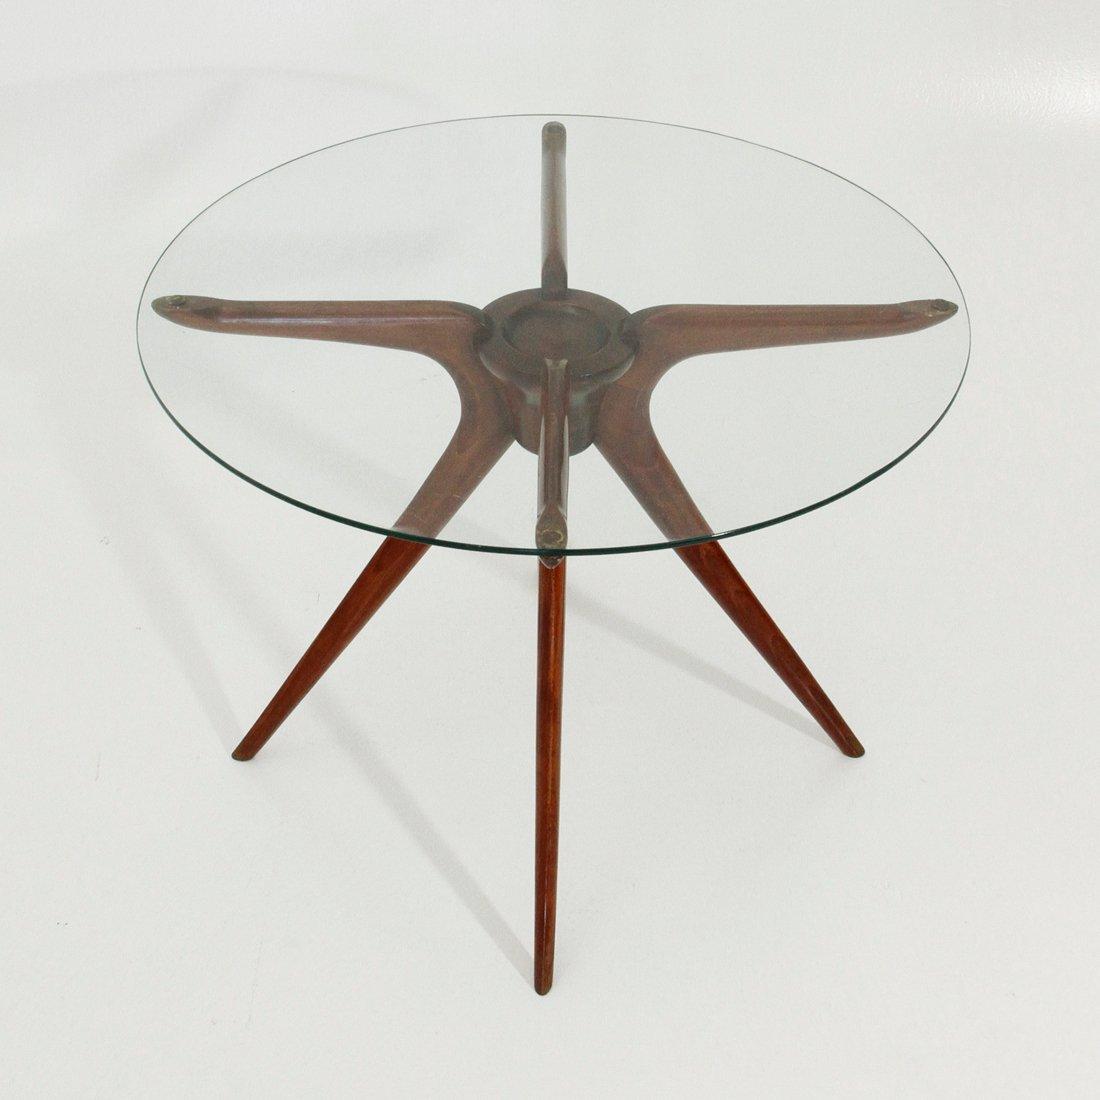 Italian Wood & Glass Coffee Table 1950s for sale at Pamono